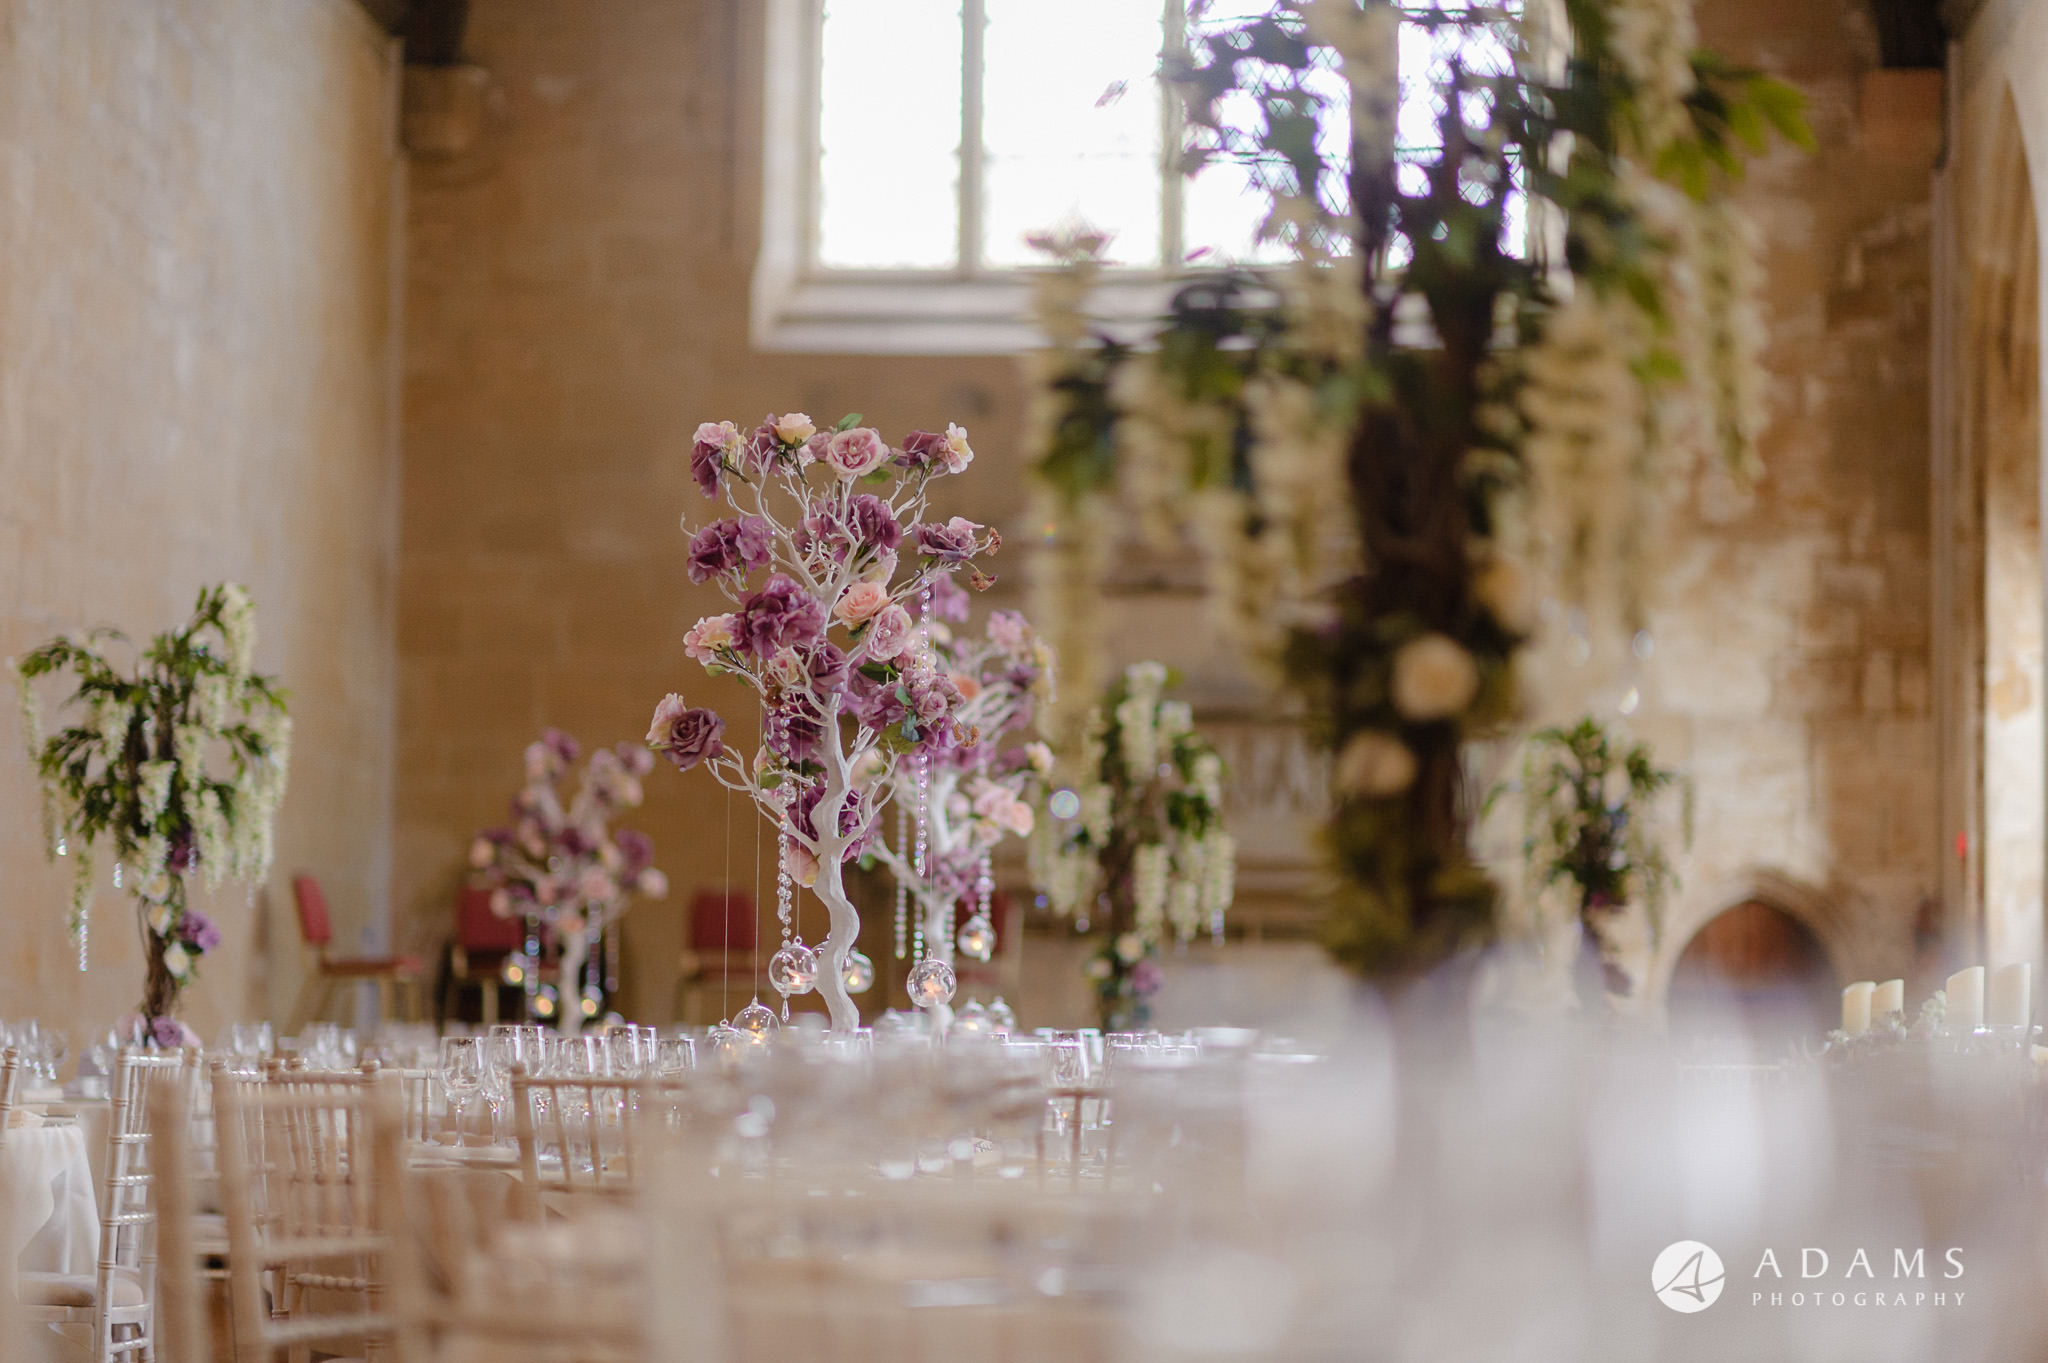 st donats castle wedding table details of flowers